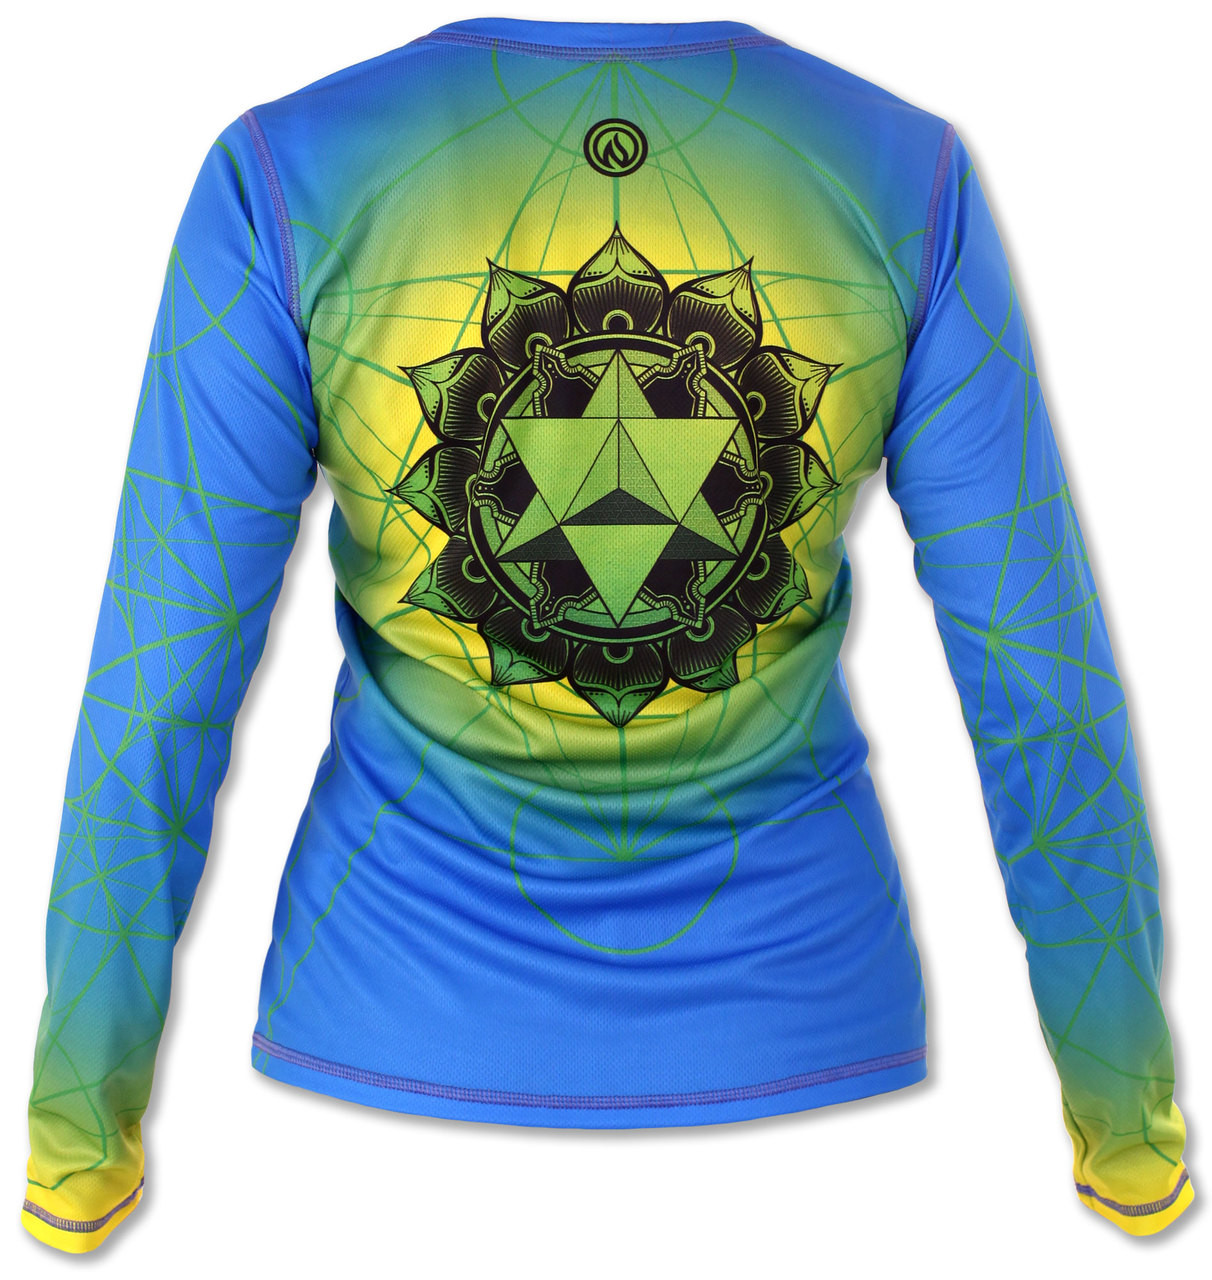 INKnBURN Women's Anahata Long Sleeve Tech Shirt Back